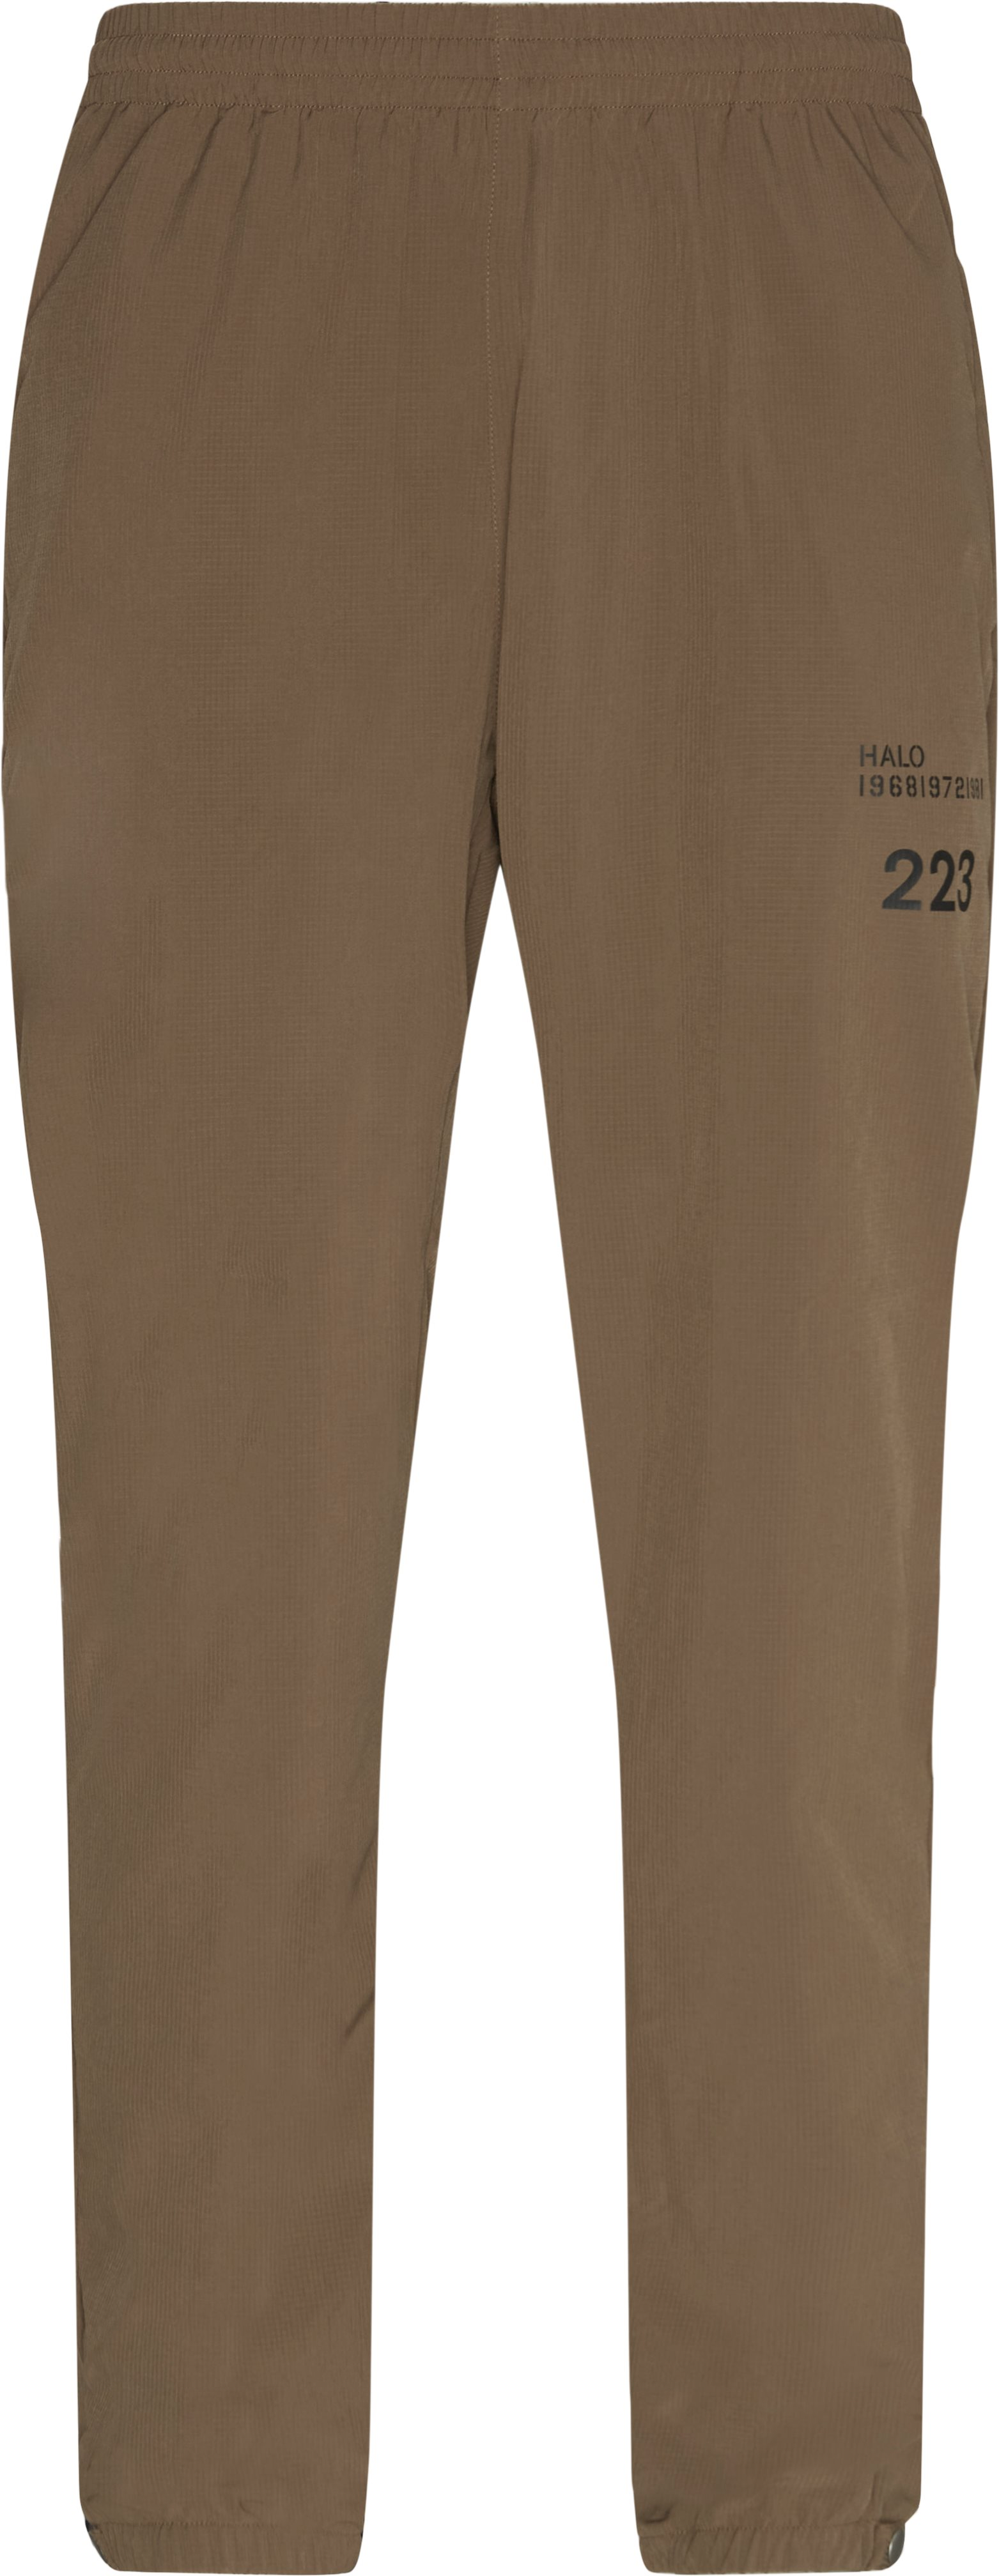 Tech Pant - Trousers - Regular fit - Sand